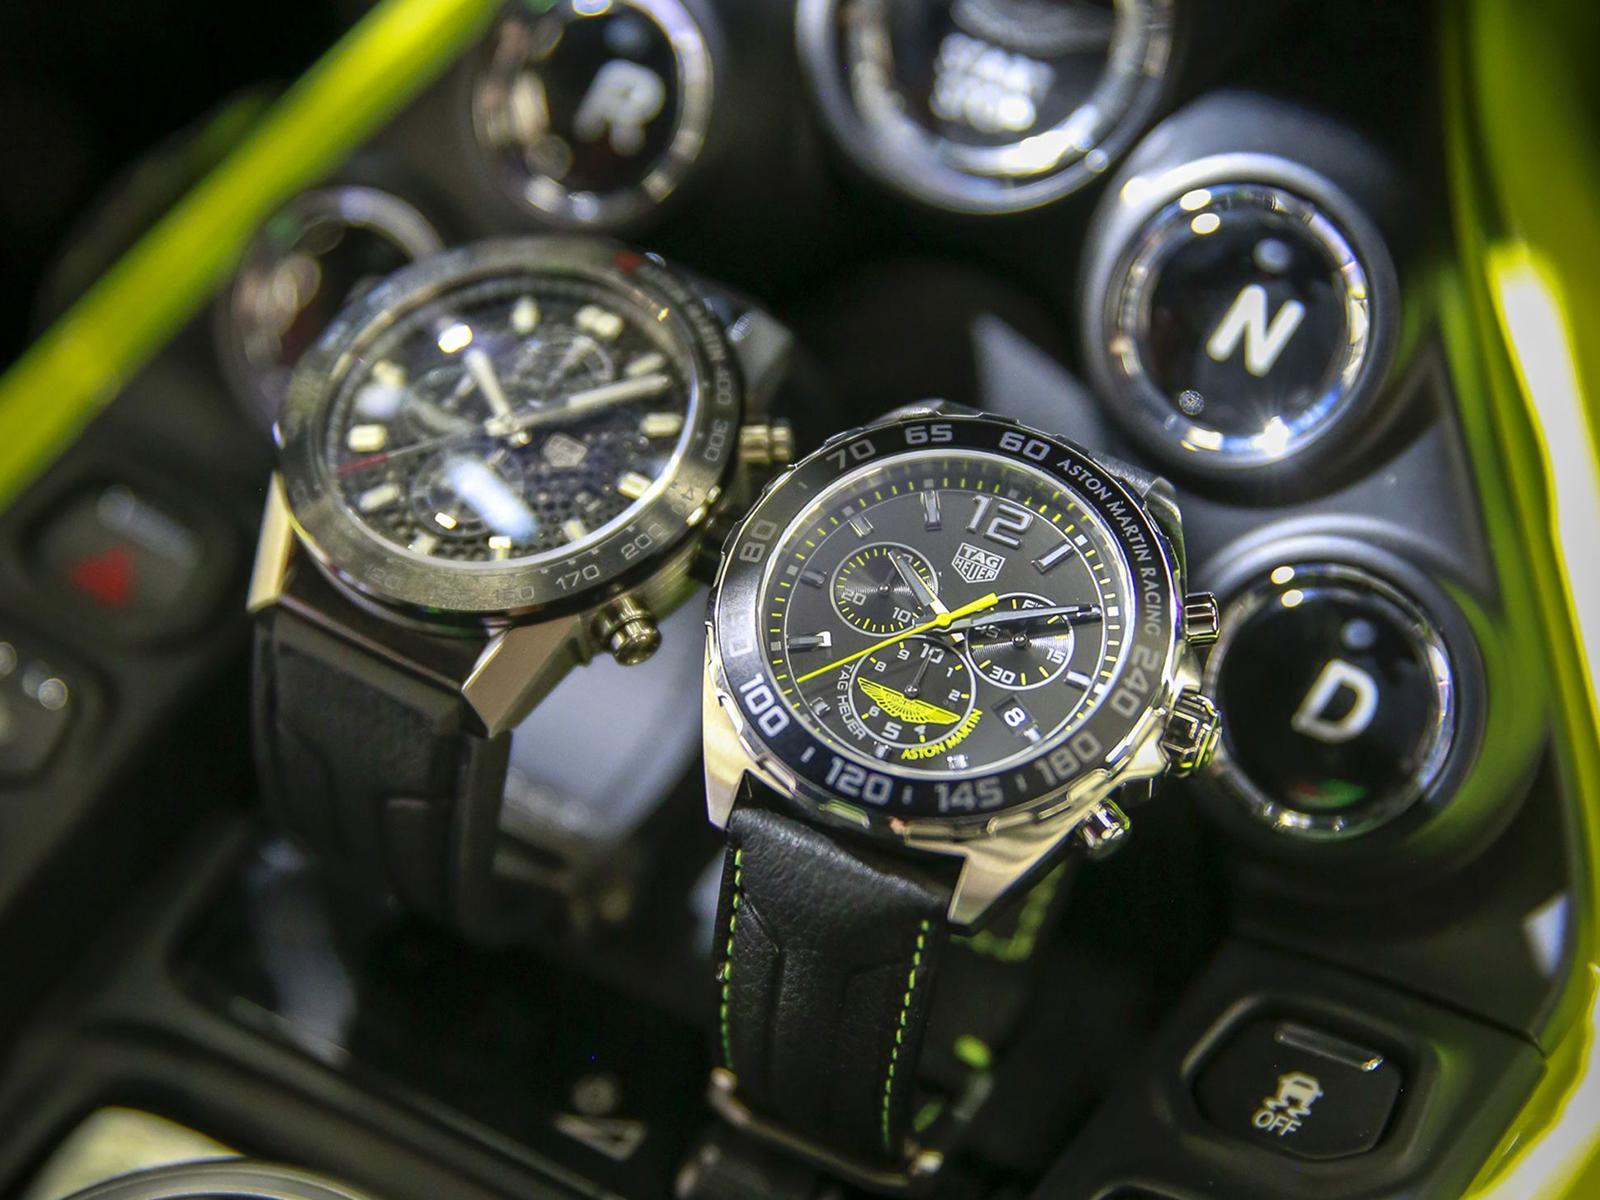 car2a1ab-ft6163-caz101p-fc8245-tag-heuer-carrera-heuer-01-aston-martin-1-.jpg